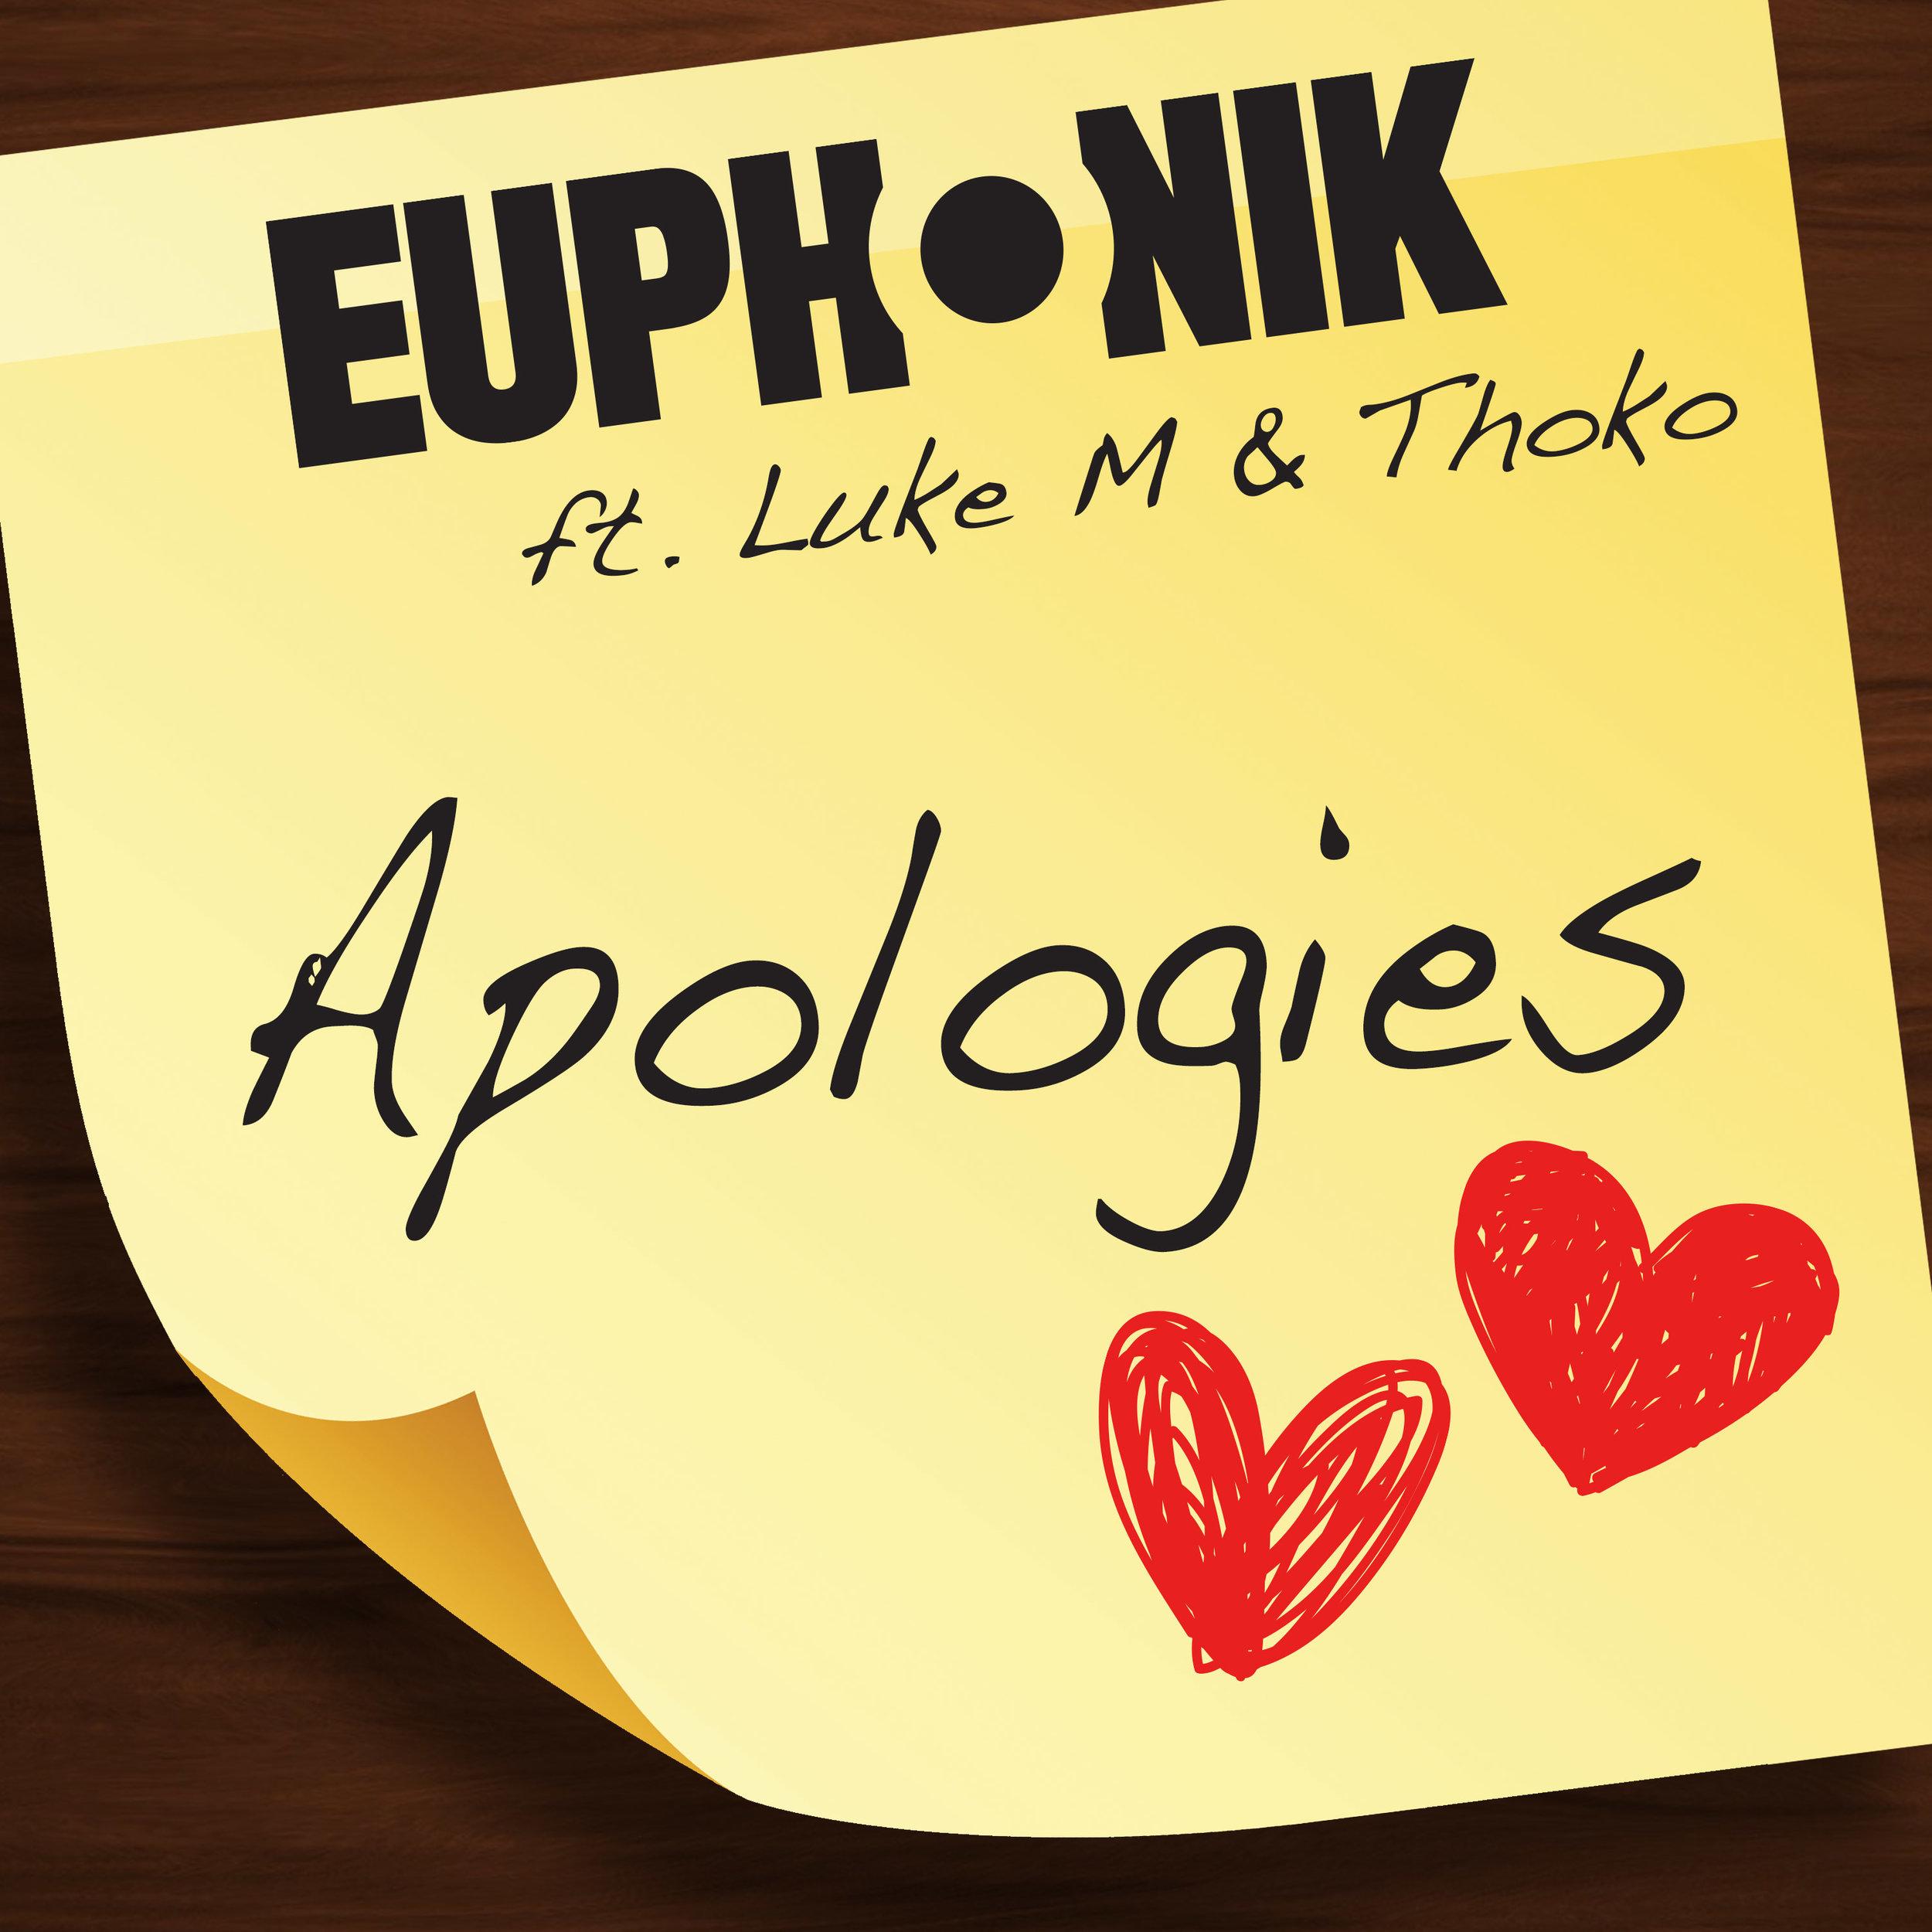 Euphonik Ft. Luke M & Thoko - Apologies_Artwork.jpg